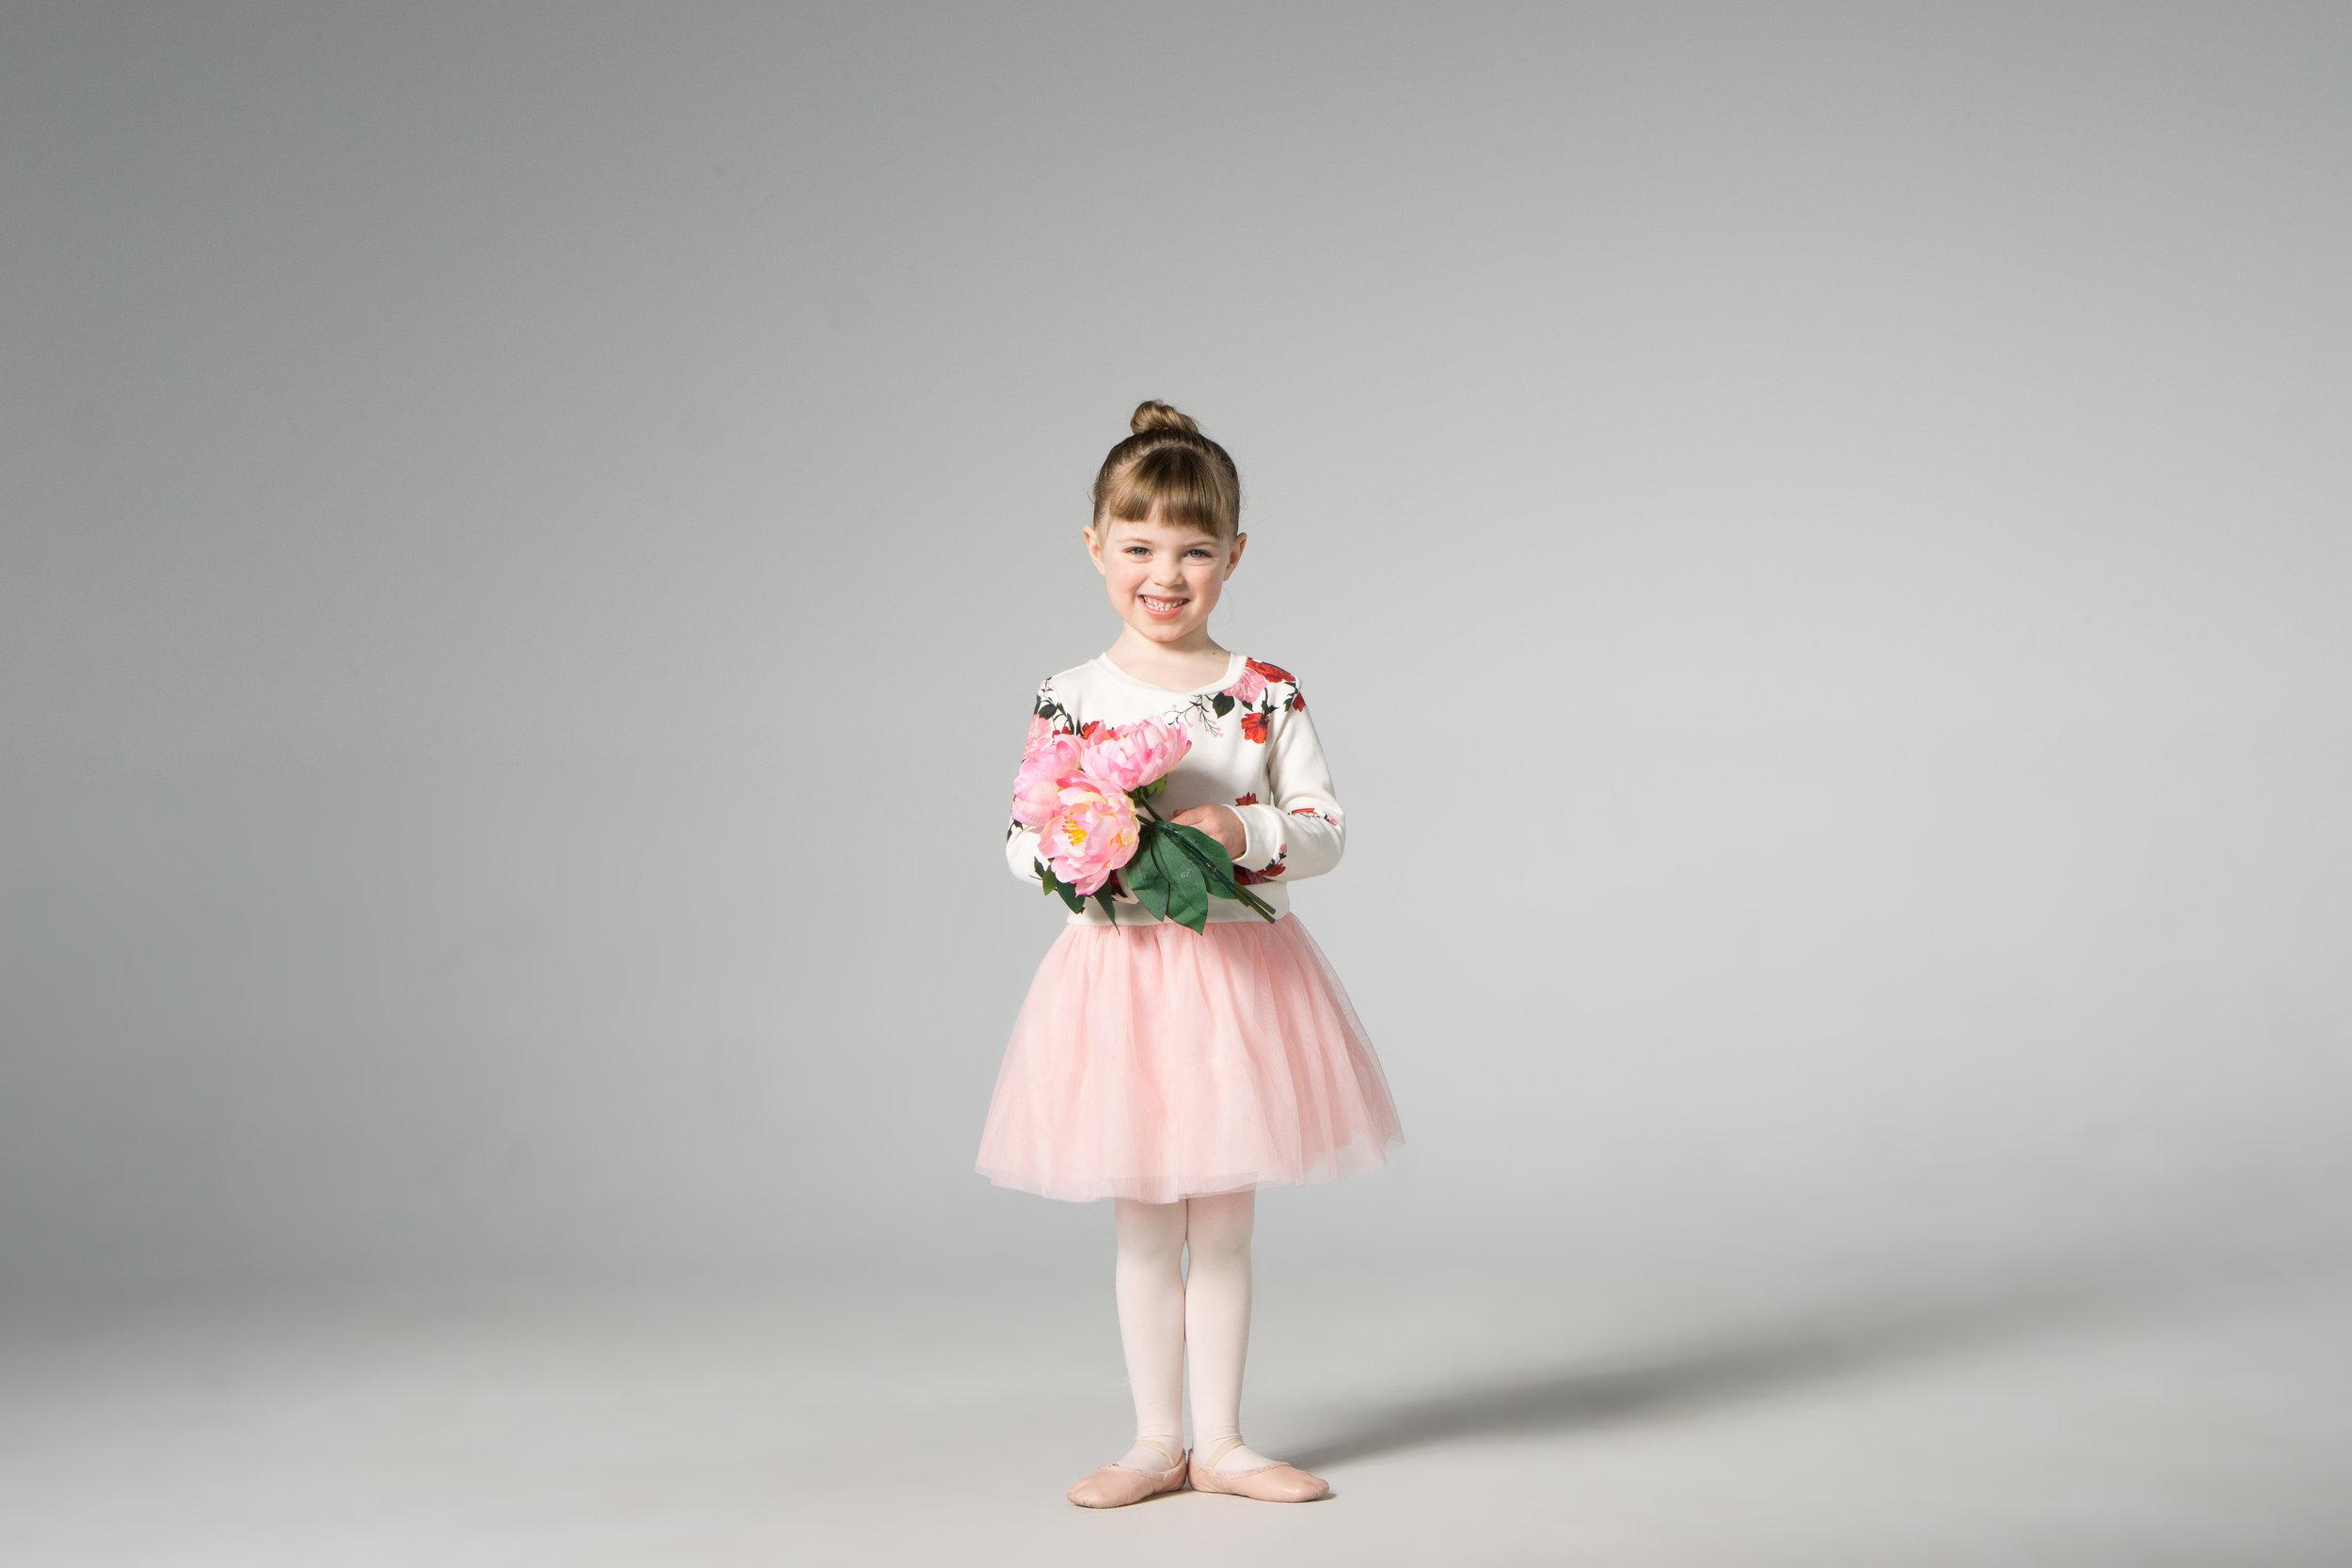 cute ballet dancer holding pink flowers